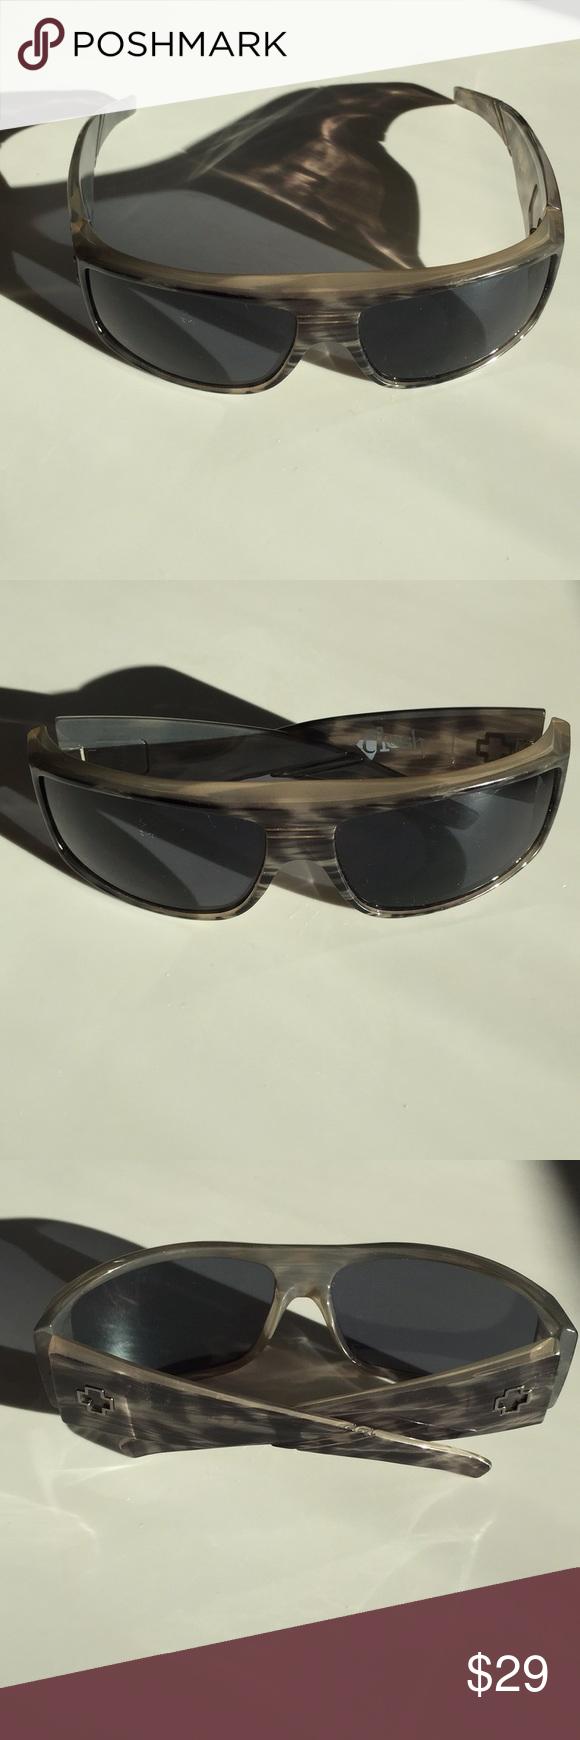 b12877101a Spy Clash Sunglasses I won t lie